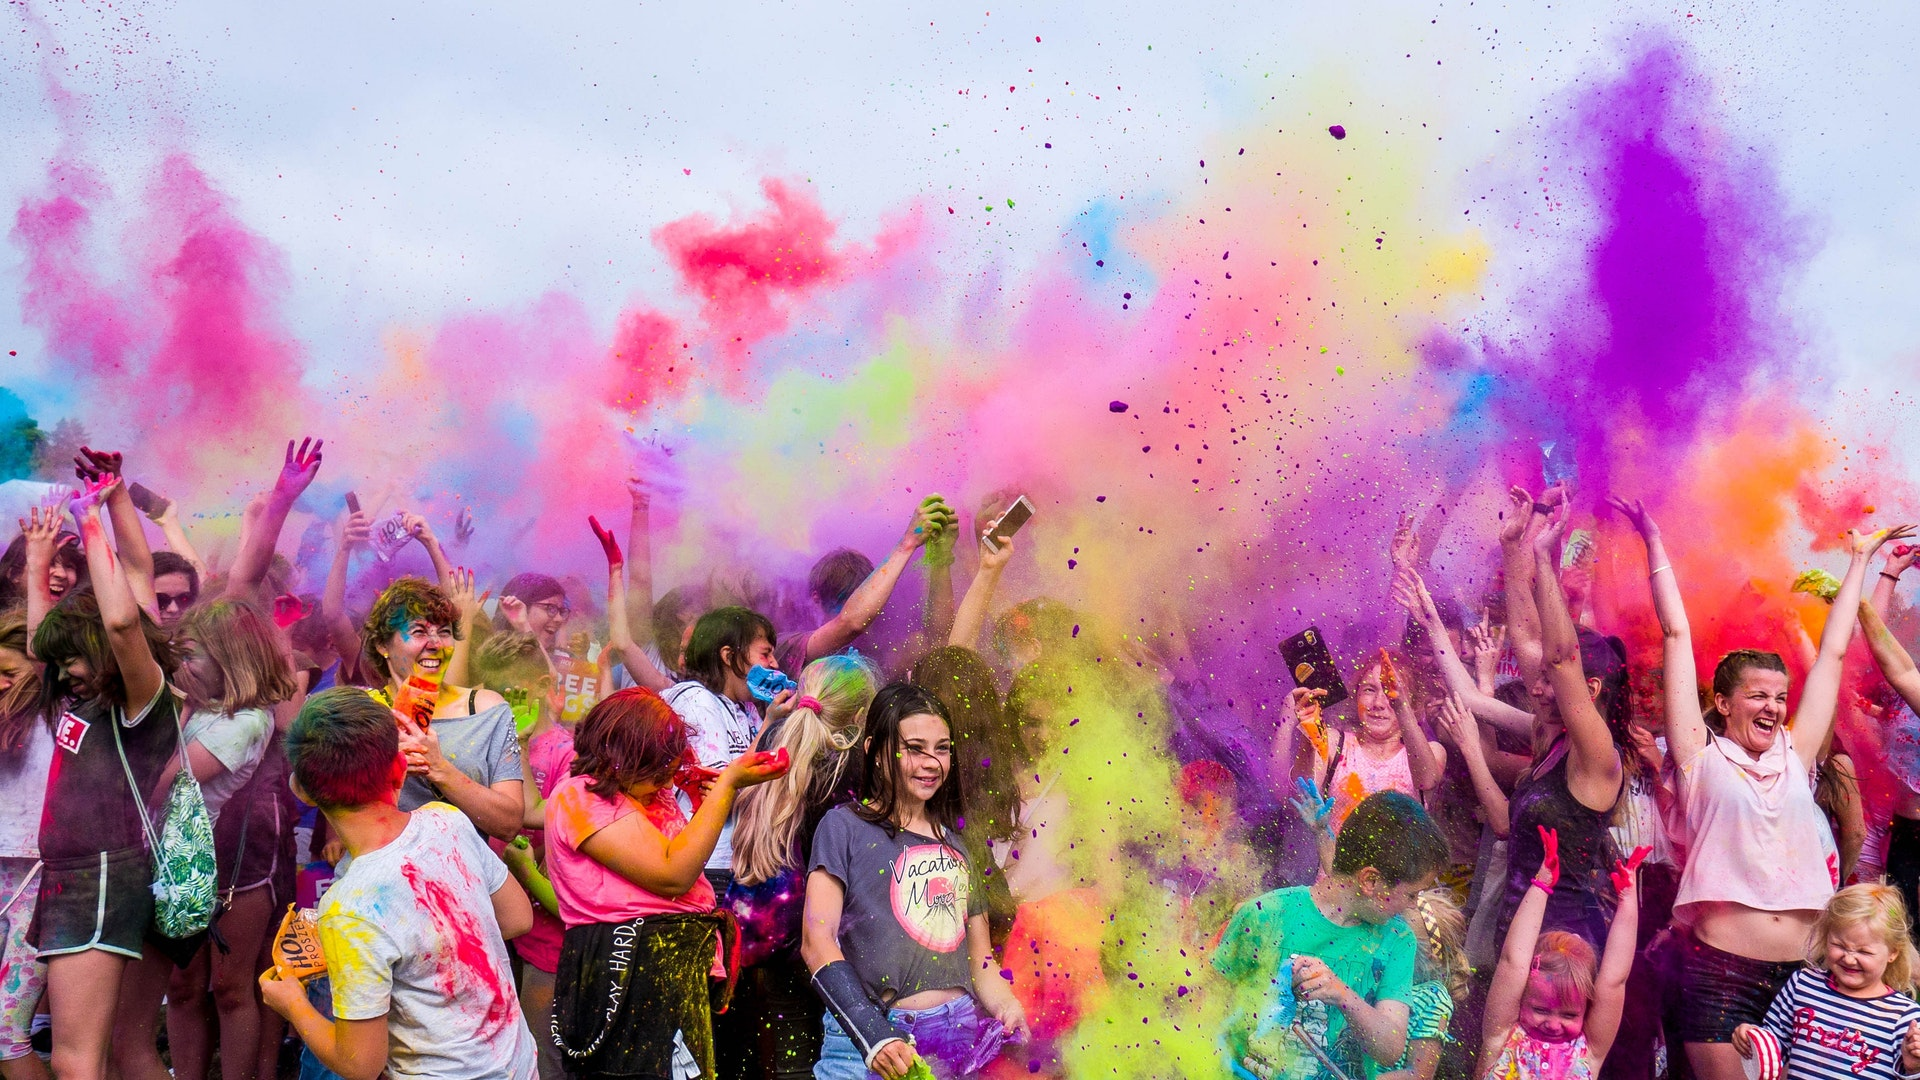 celebration-colorful-colourful-1684187.jpg